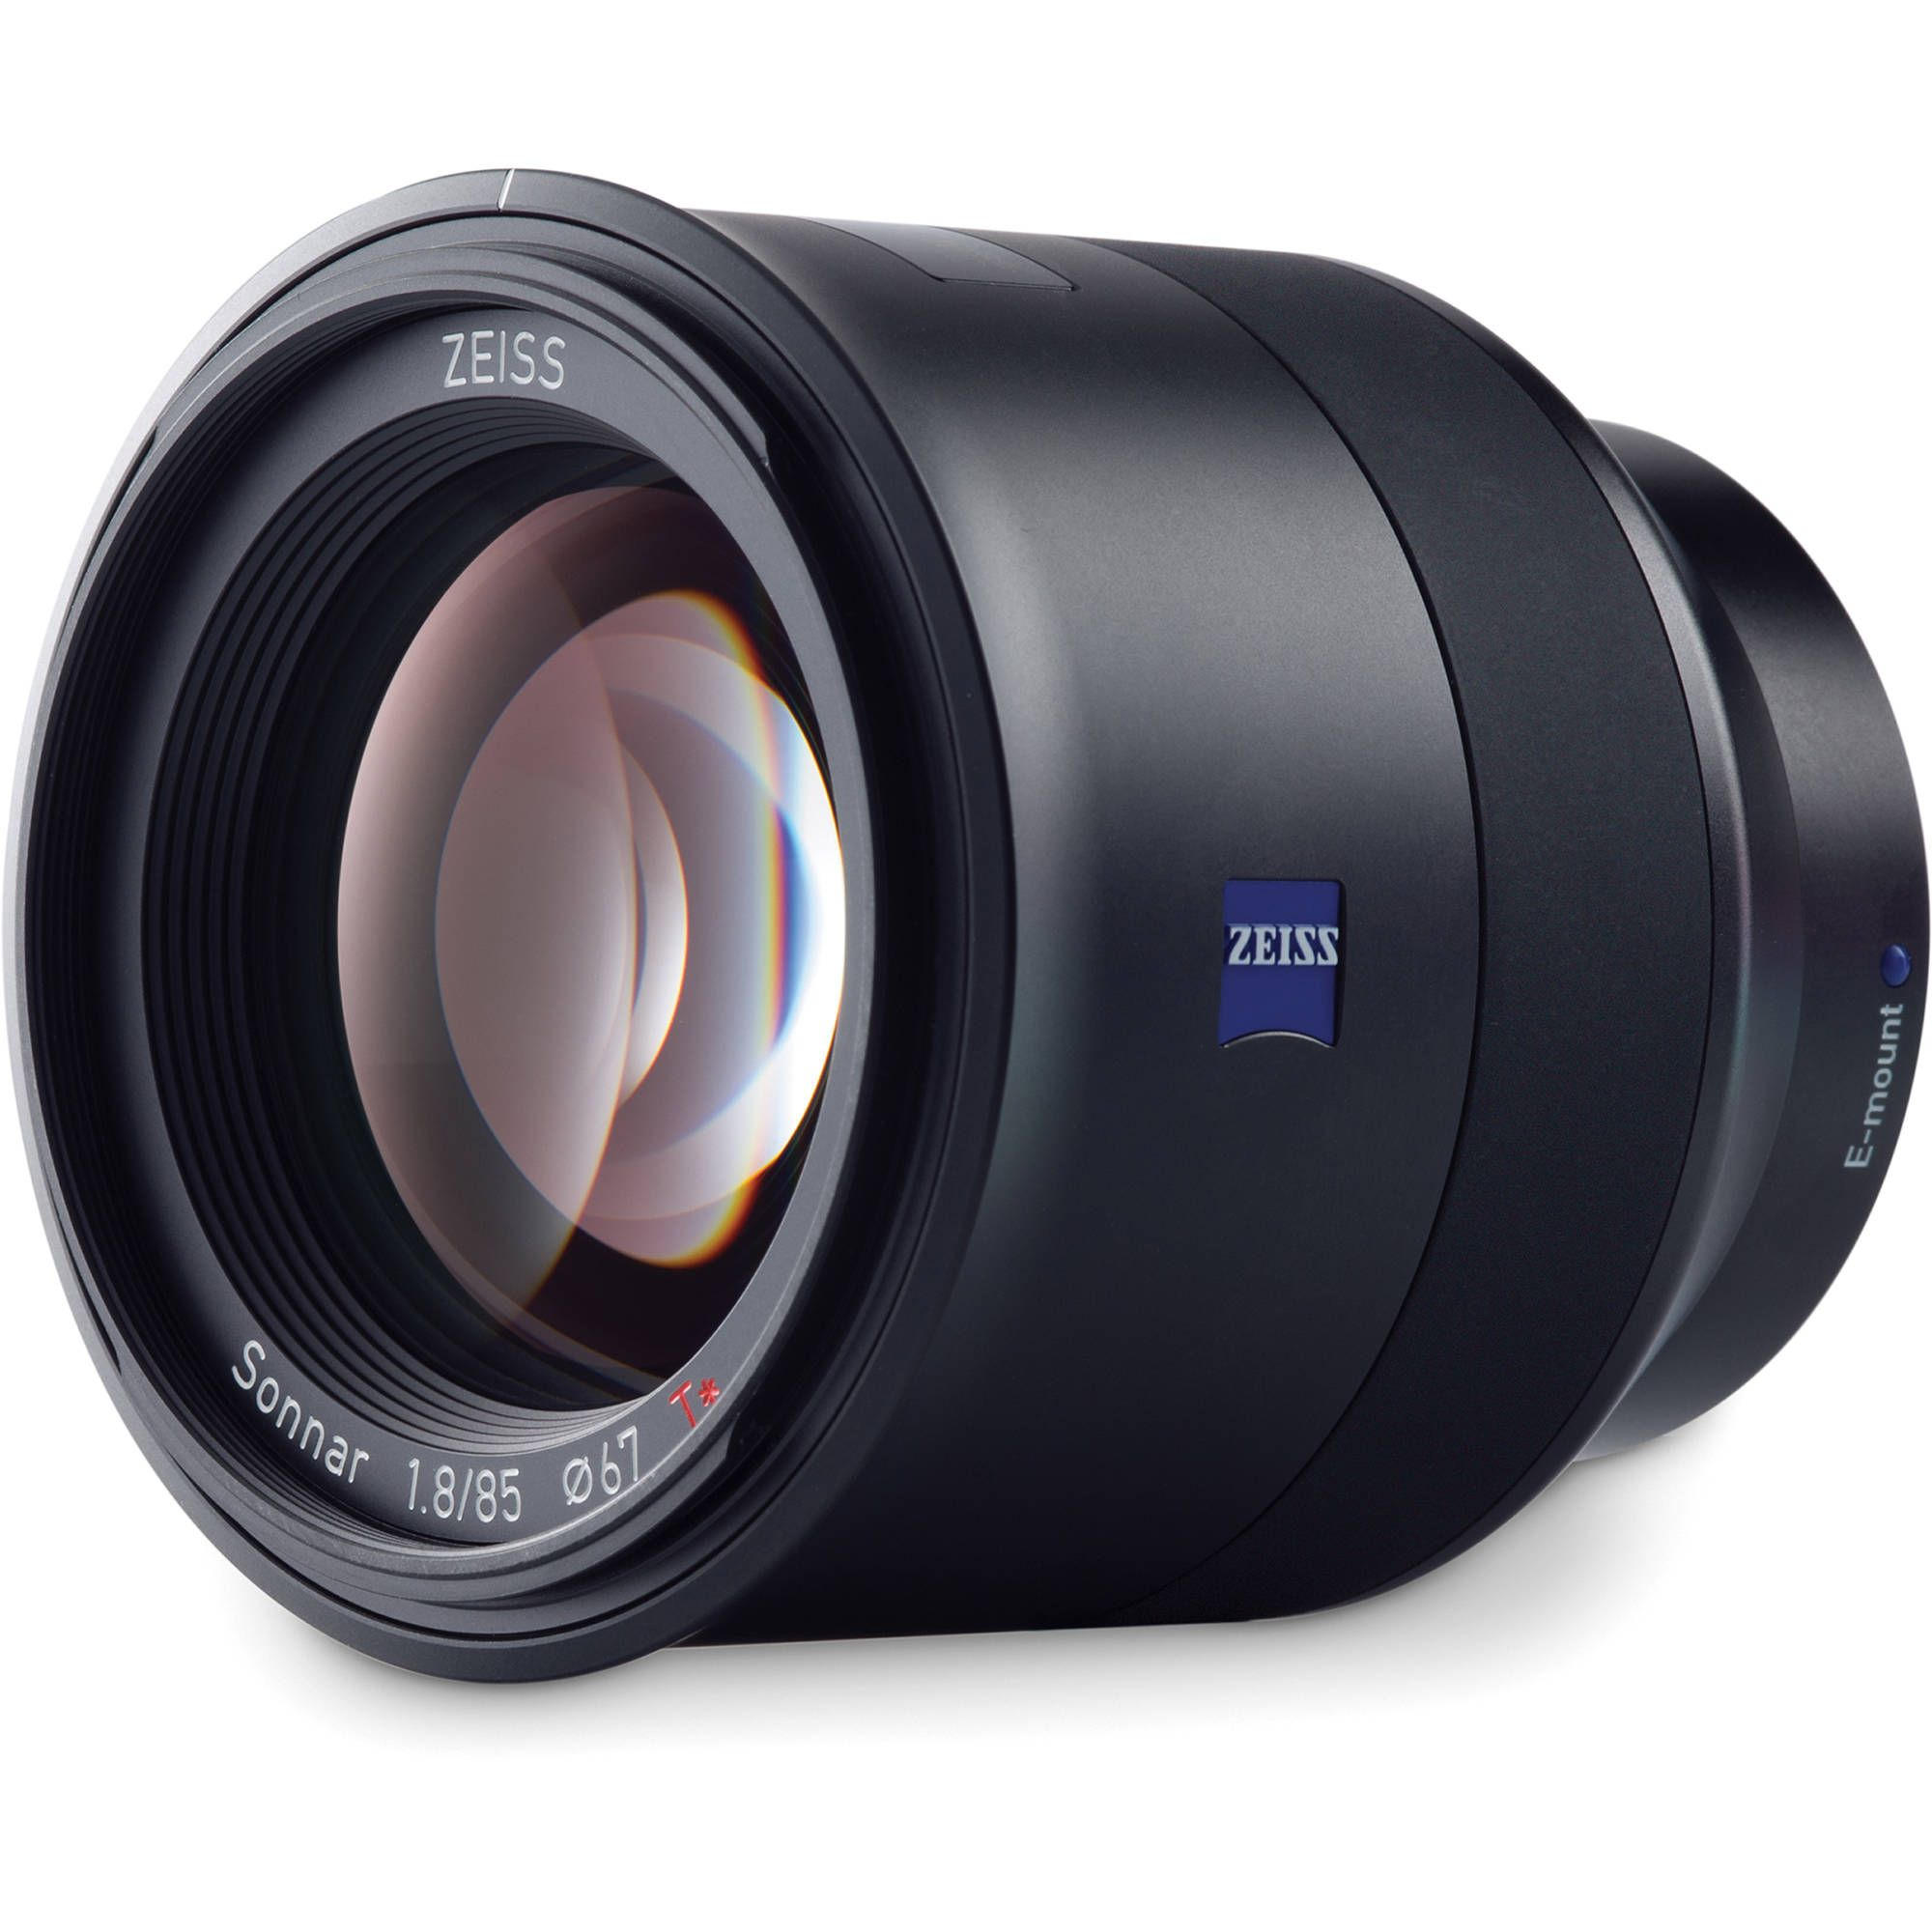 Batis 85mm f/1.8 Lens for Sony E Mount | Sony, Lenses and Cameras